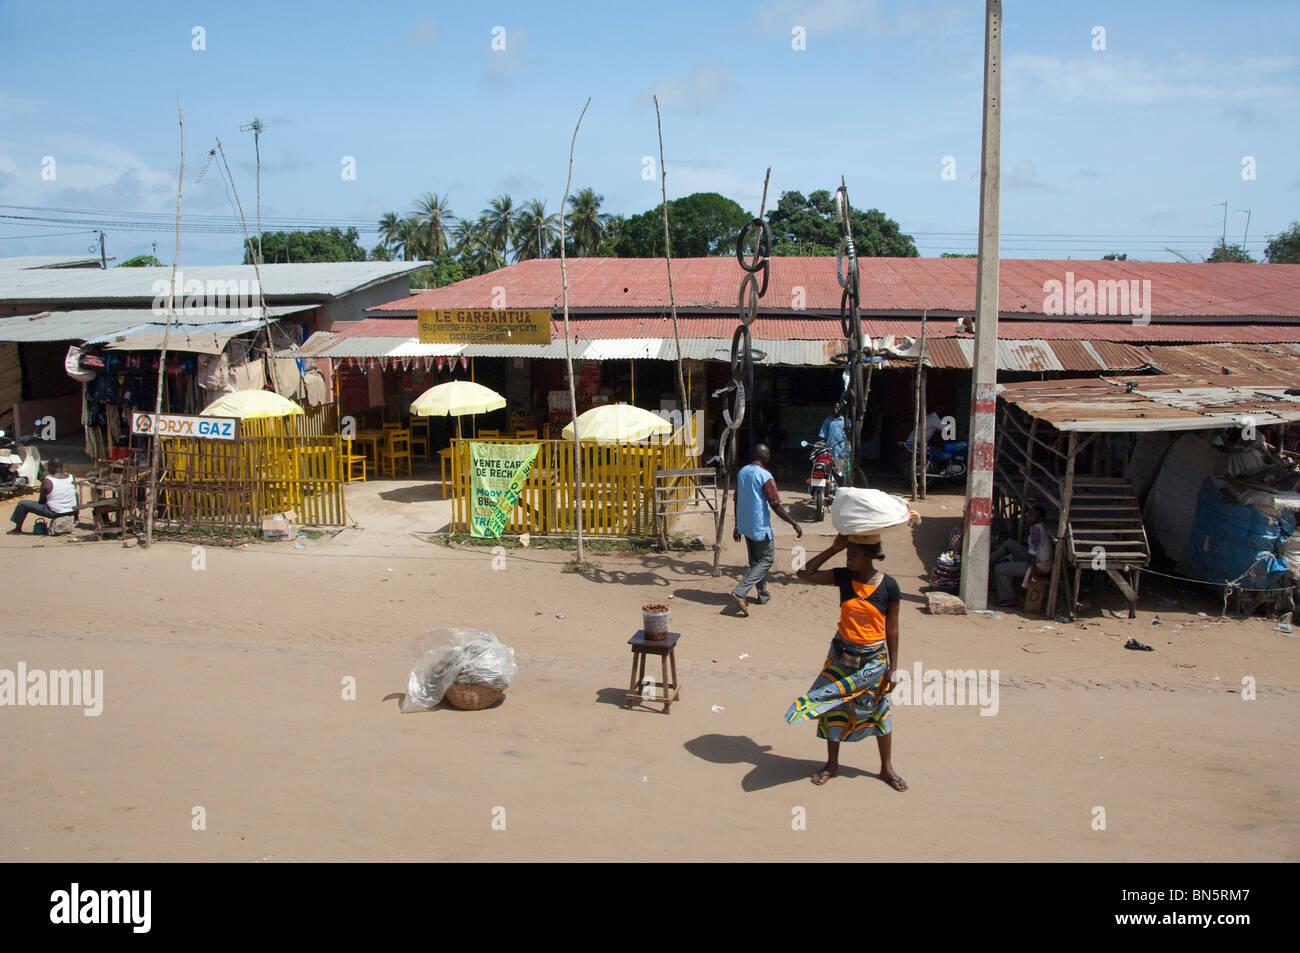 Africa, Benin, Ouidah. Typical street scene in Ouidah. - Stock Image